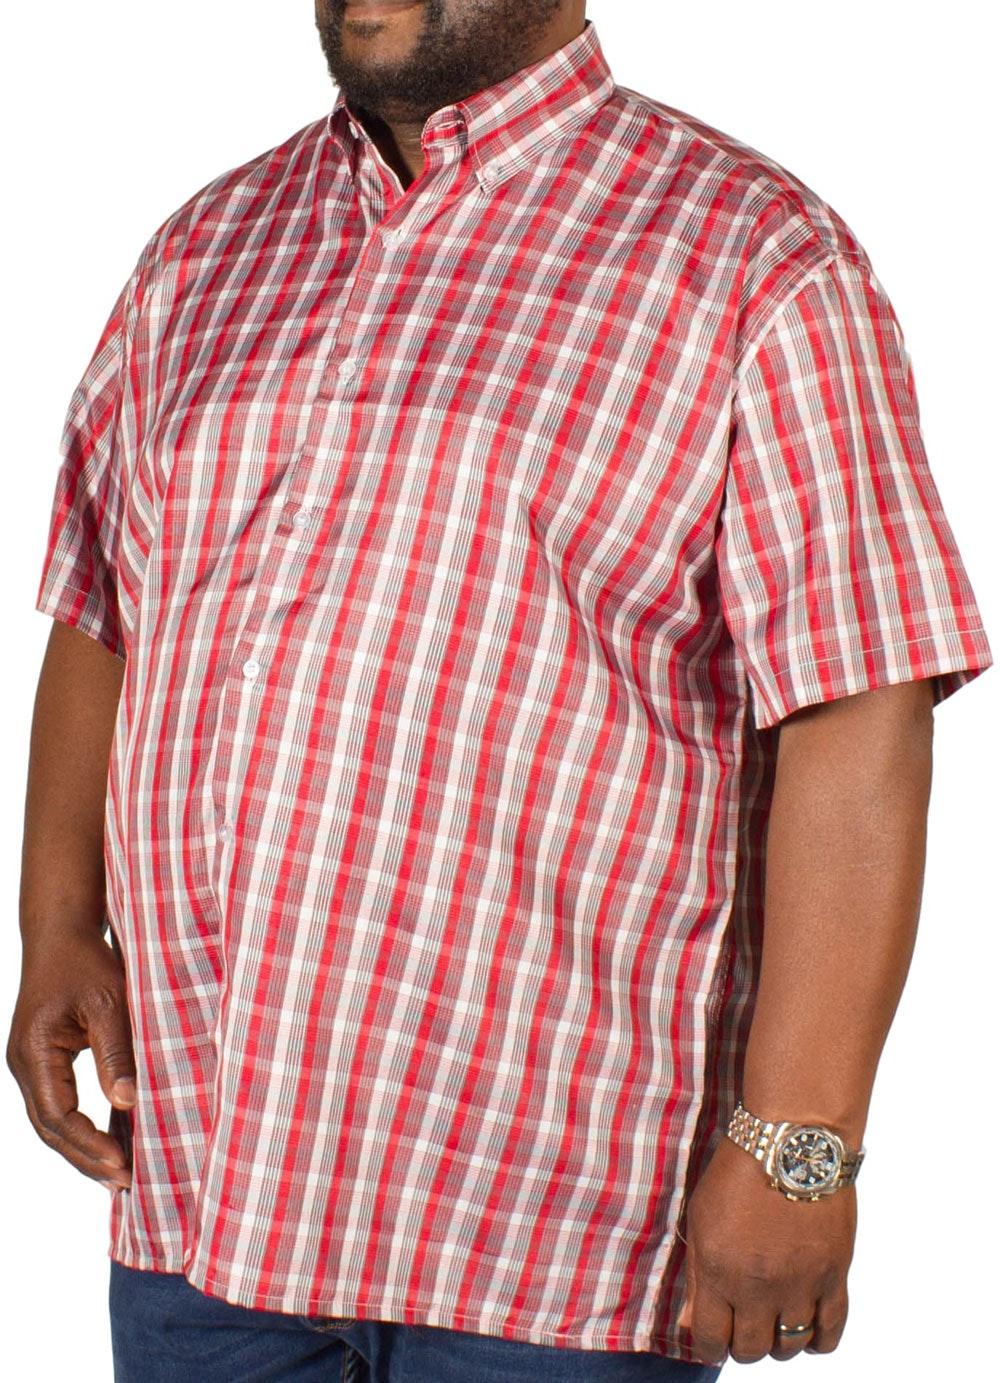 Fitzgerald Jamie Check Shirt Red/Grey